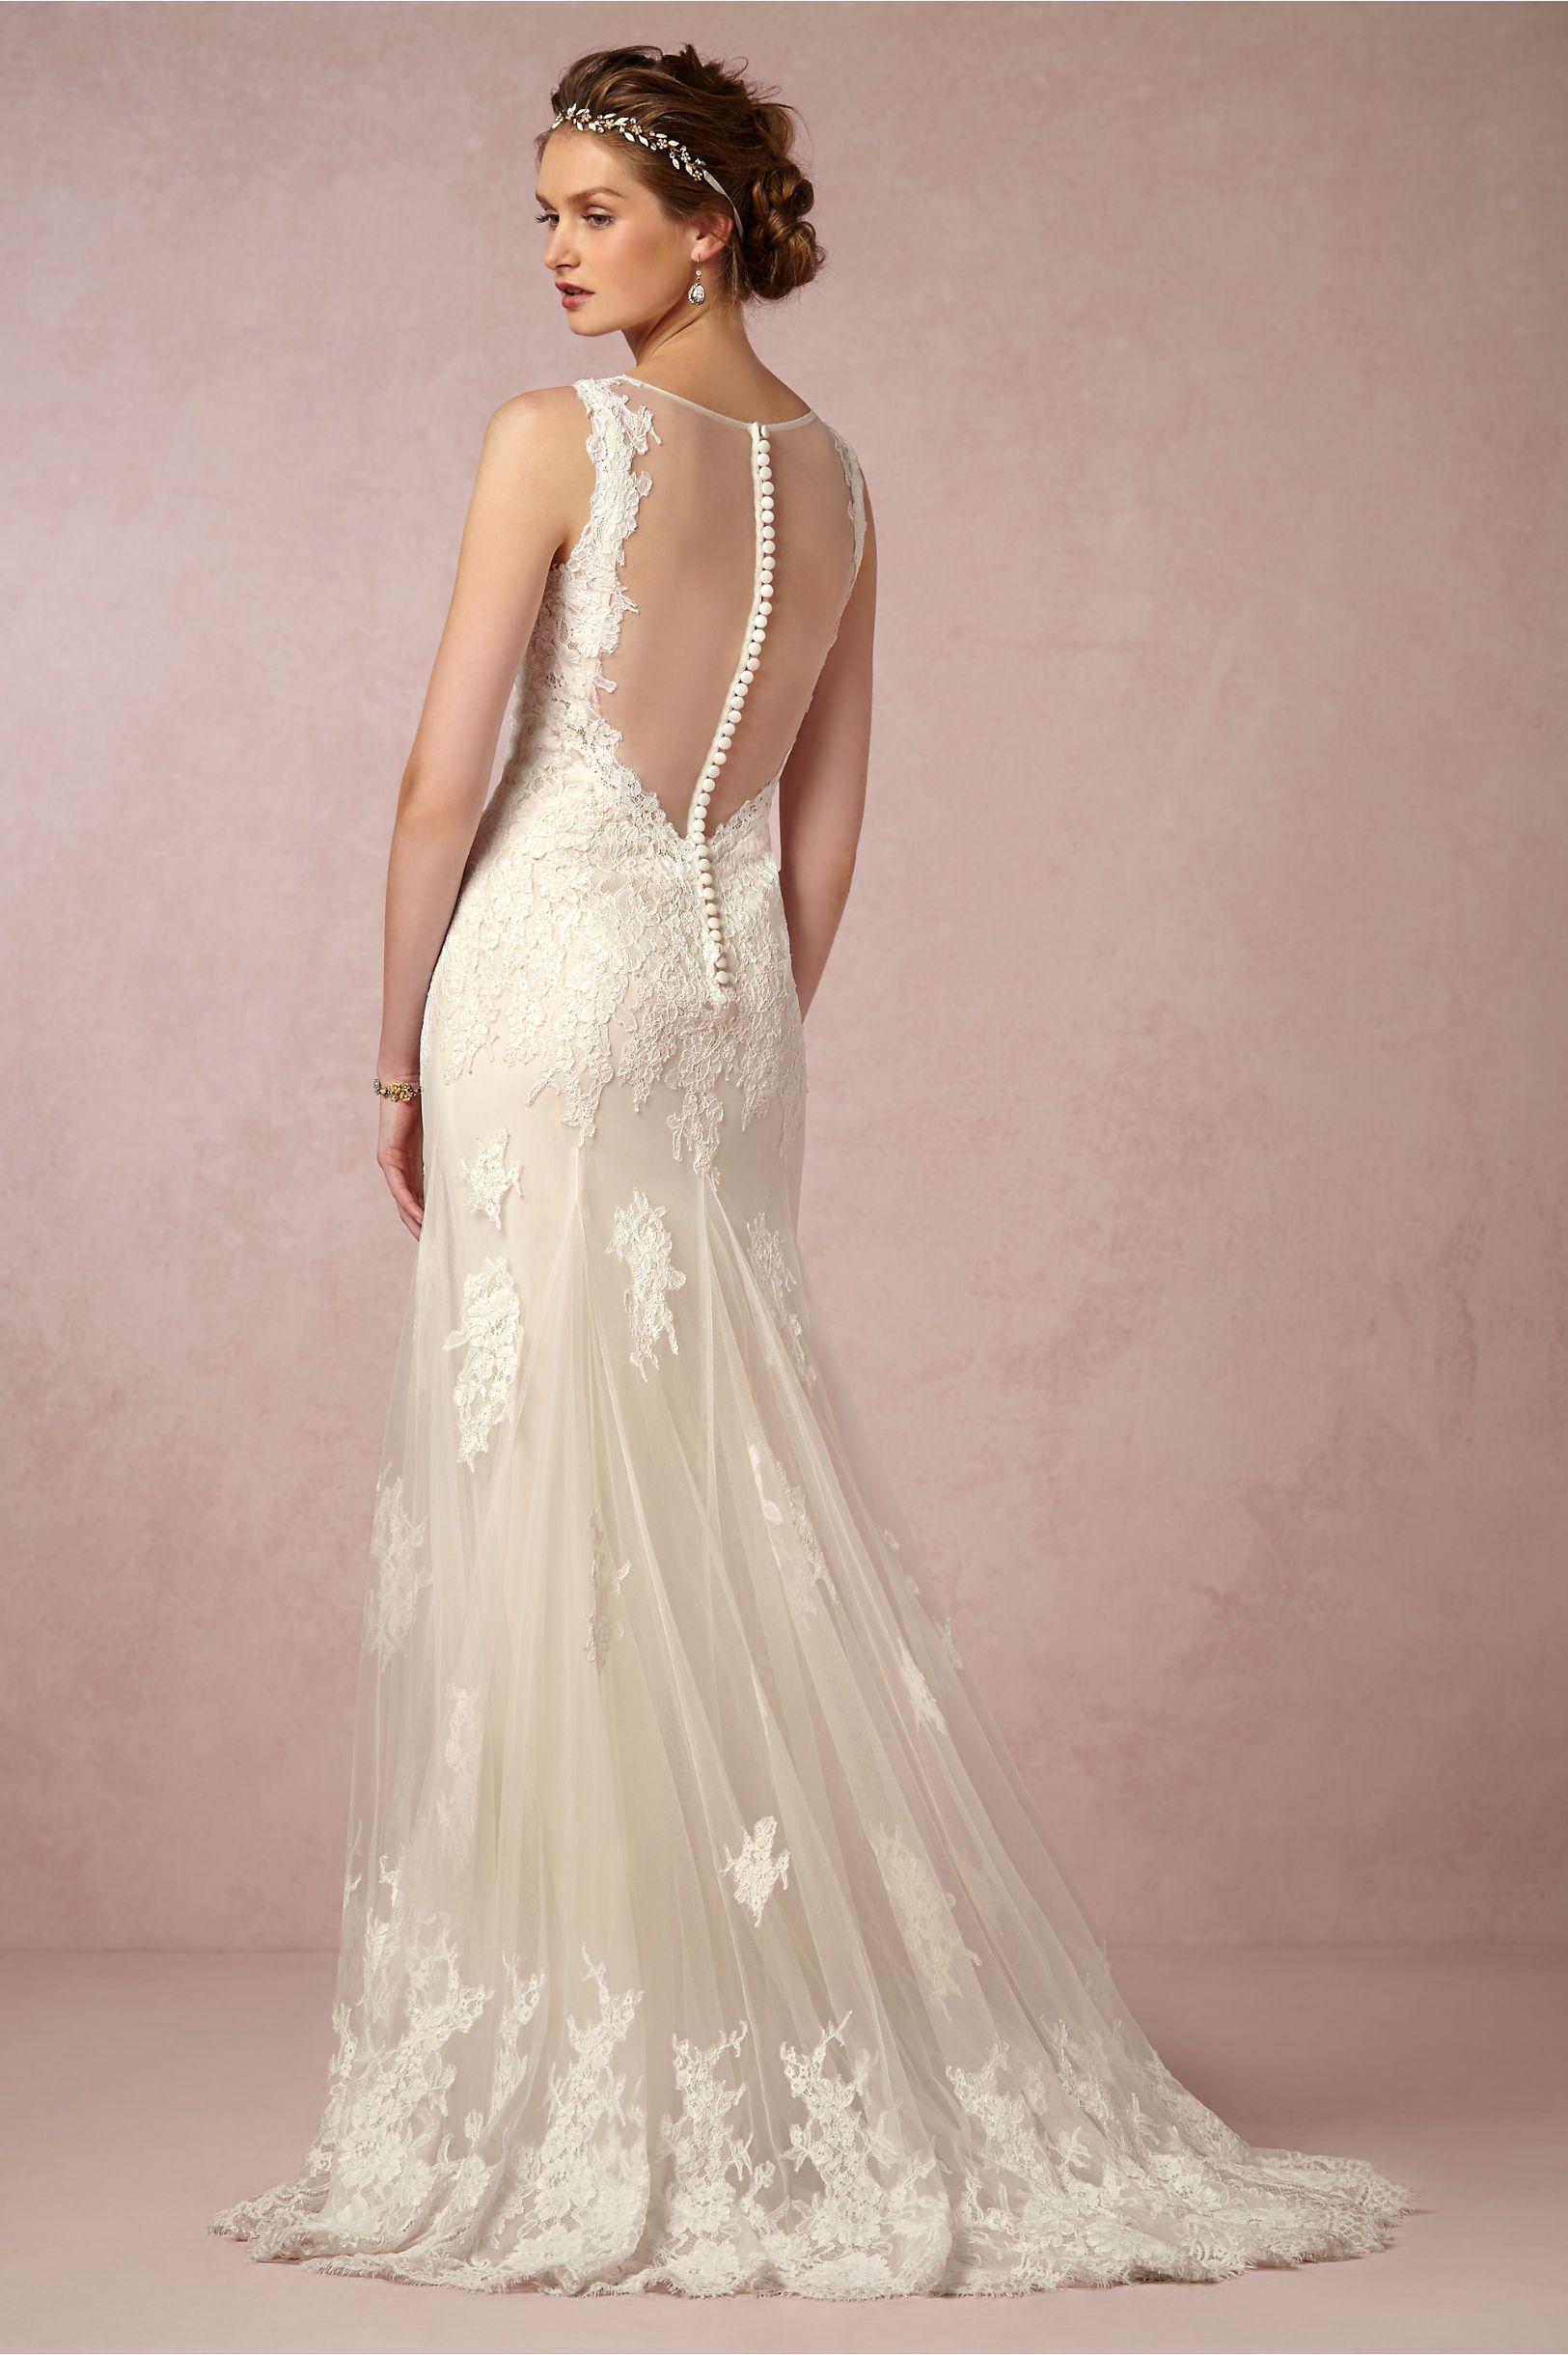 Francine Gown in Bride Wedding Dresses at BHLDN | Divinos modelos ...